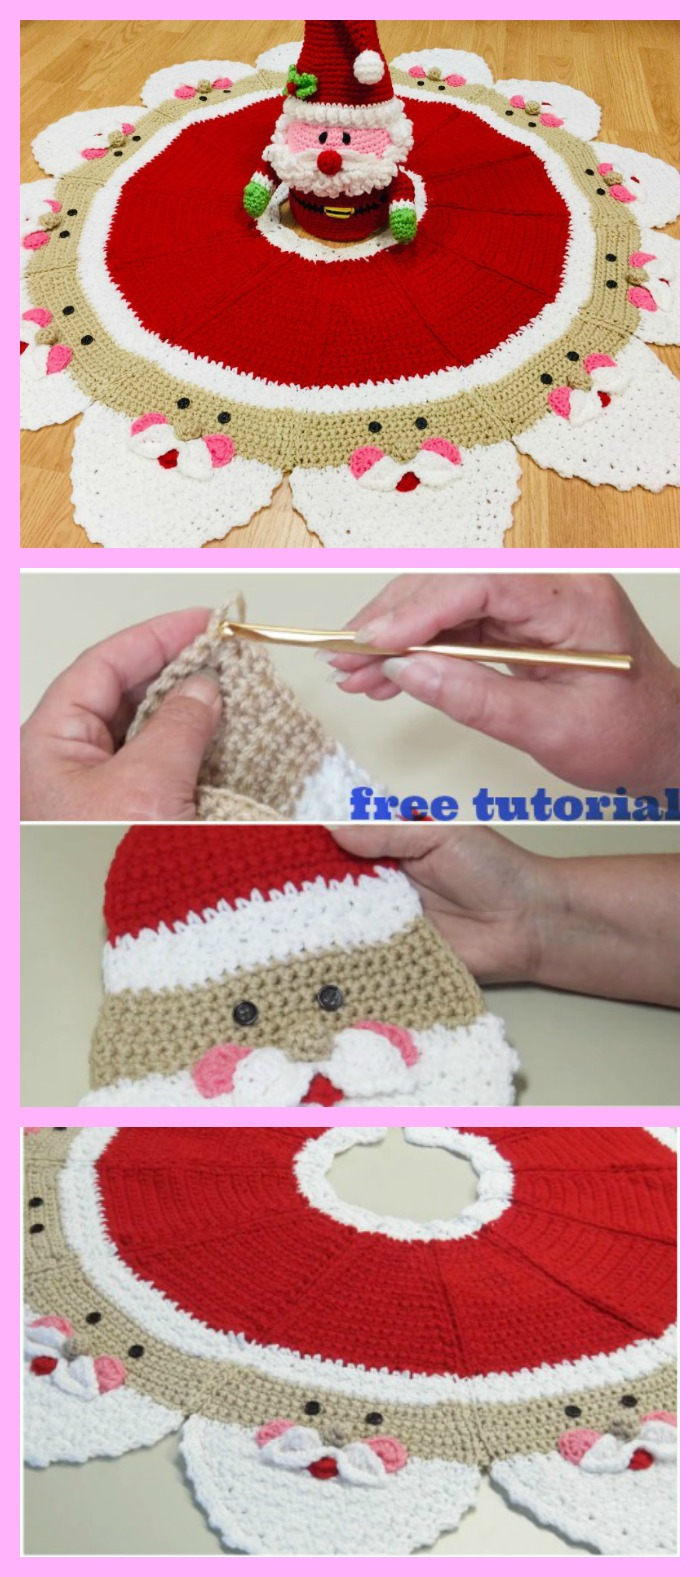 diy4ever-Crochet Santa Christmas Tree Skirt - Free Tutorial